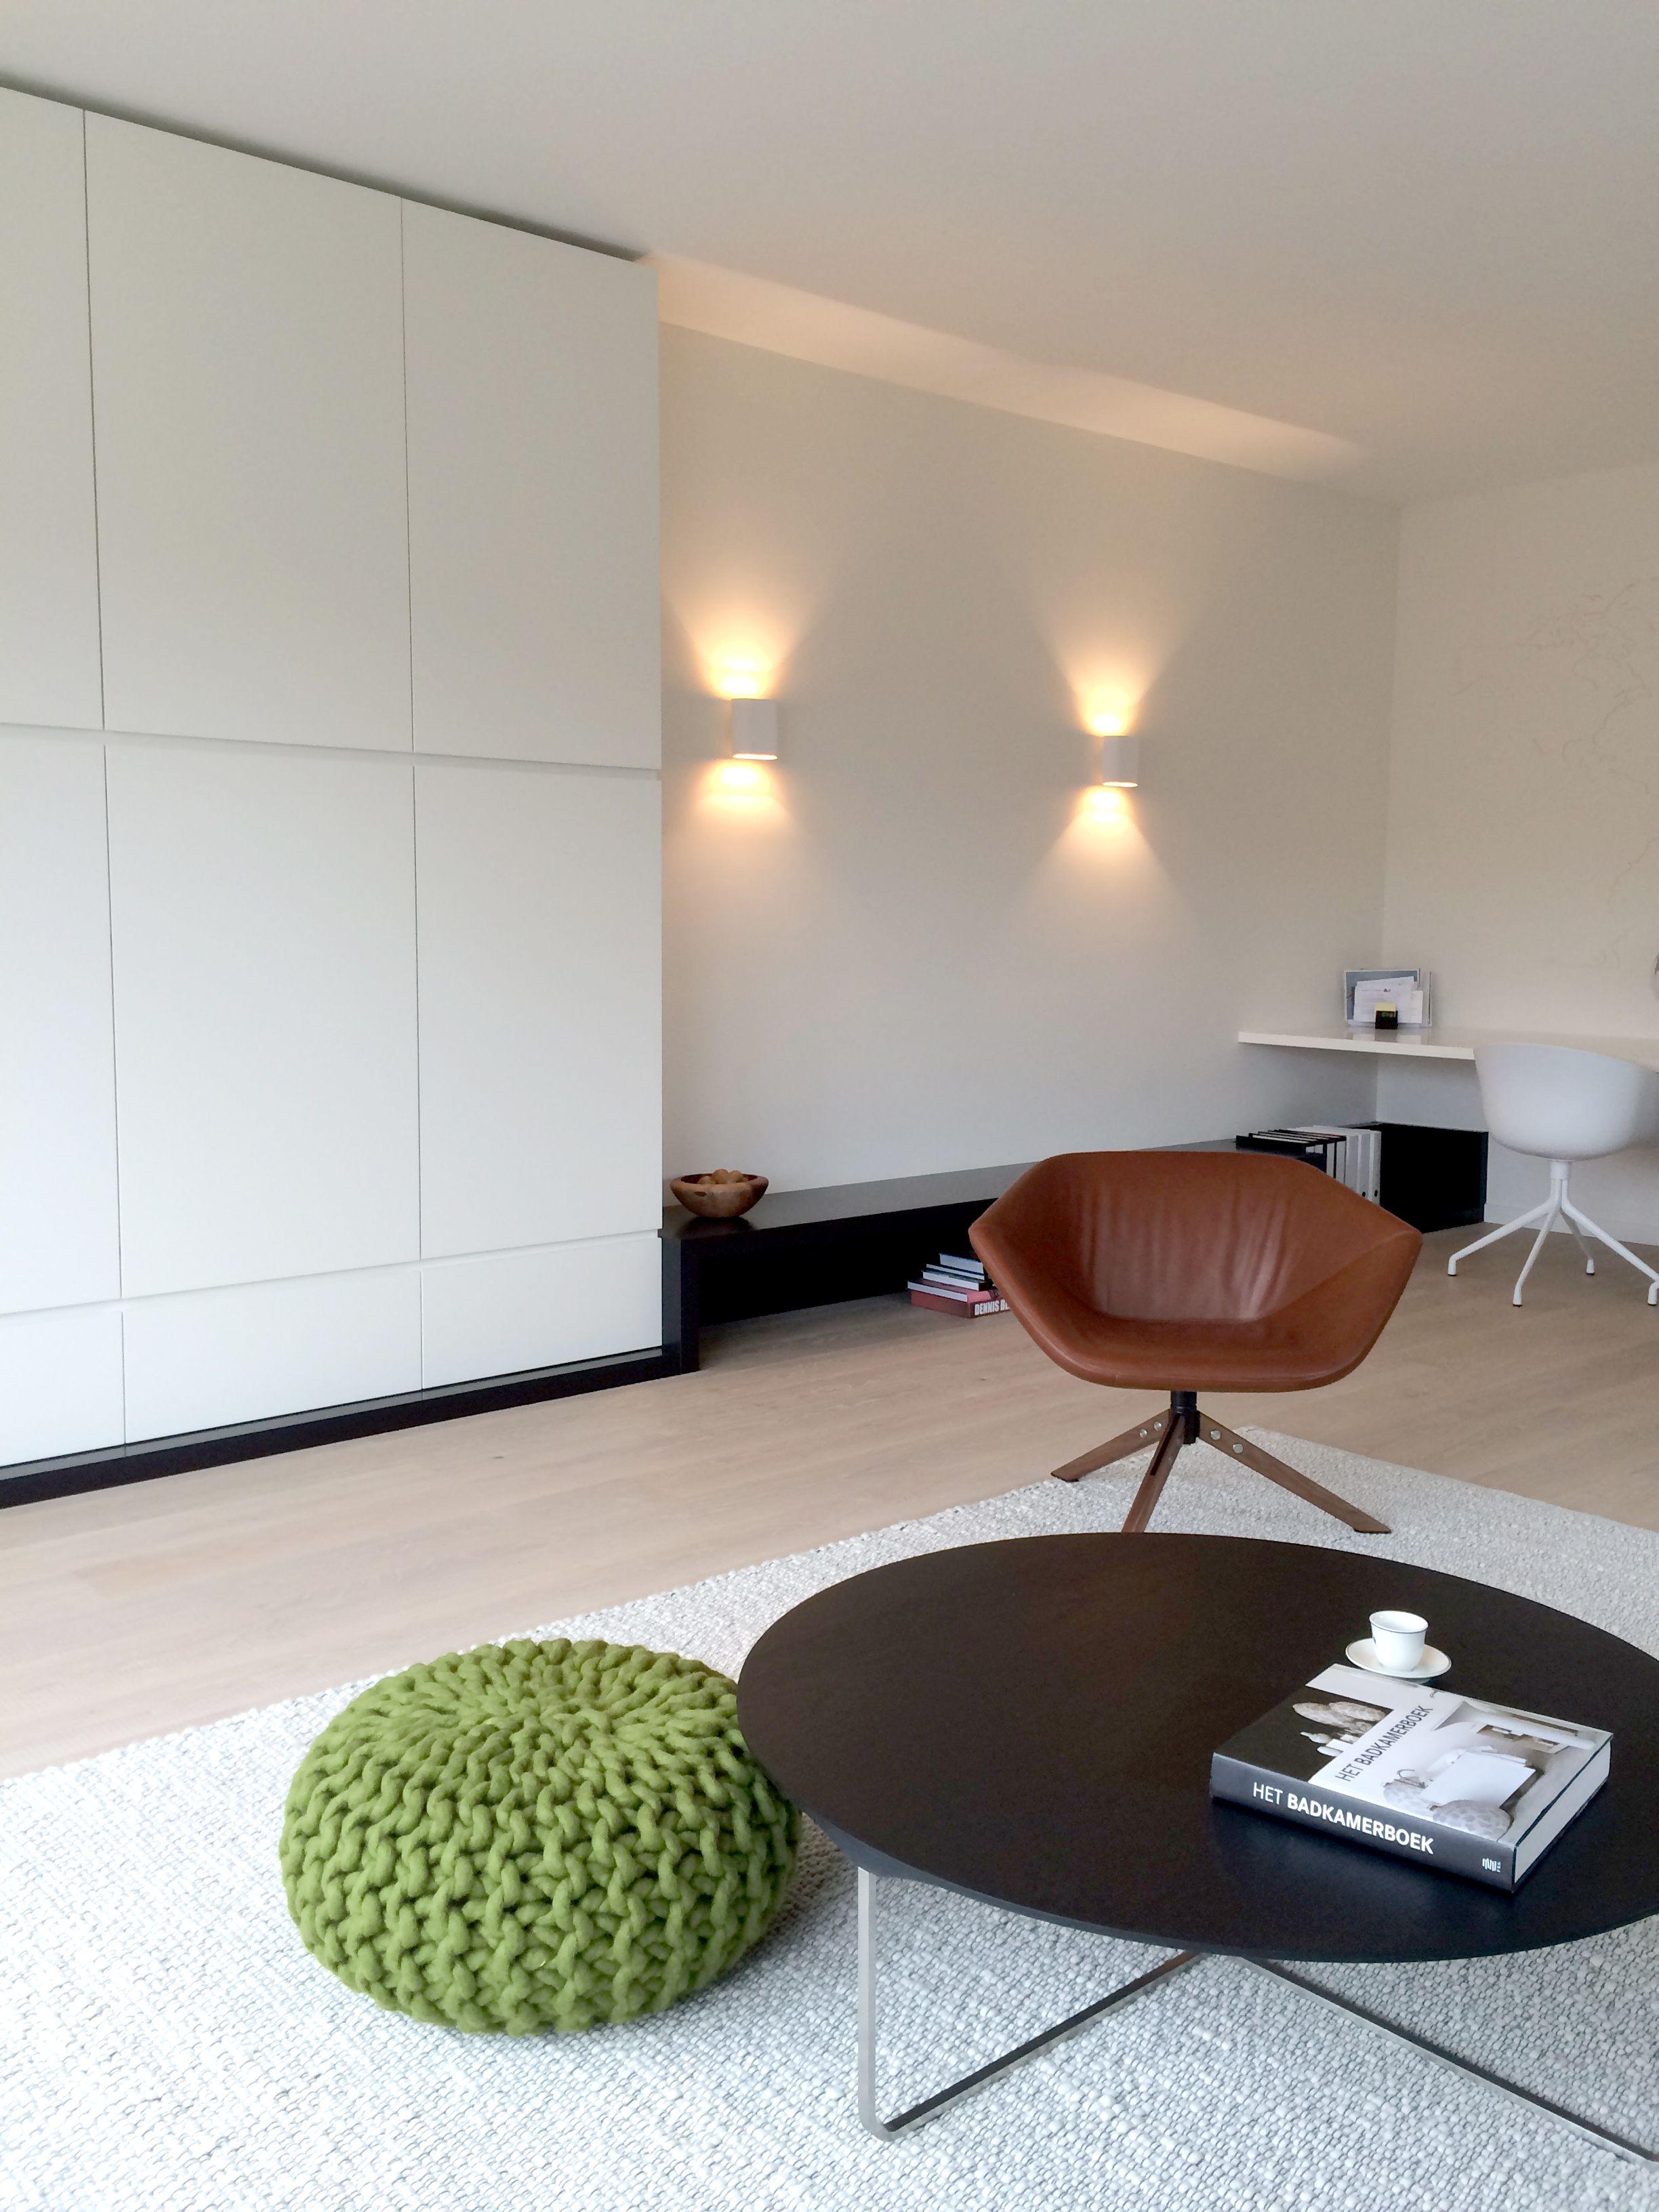 studio-EI -- Woning 15: \'s Gravendeel. Interieurontwerp ...